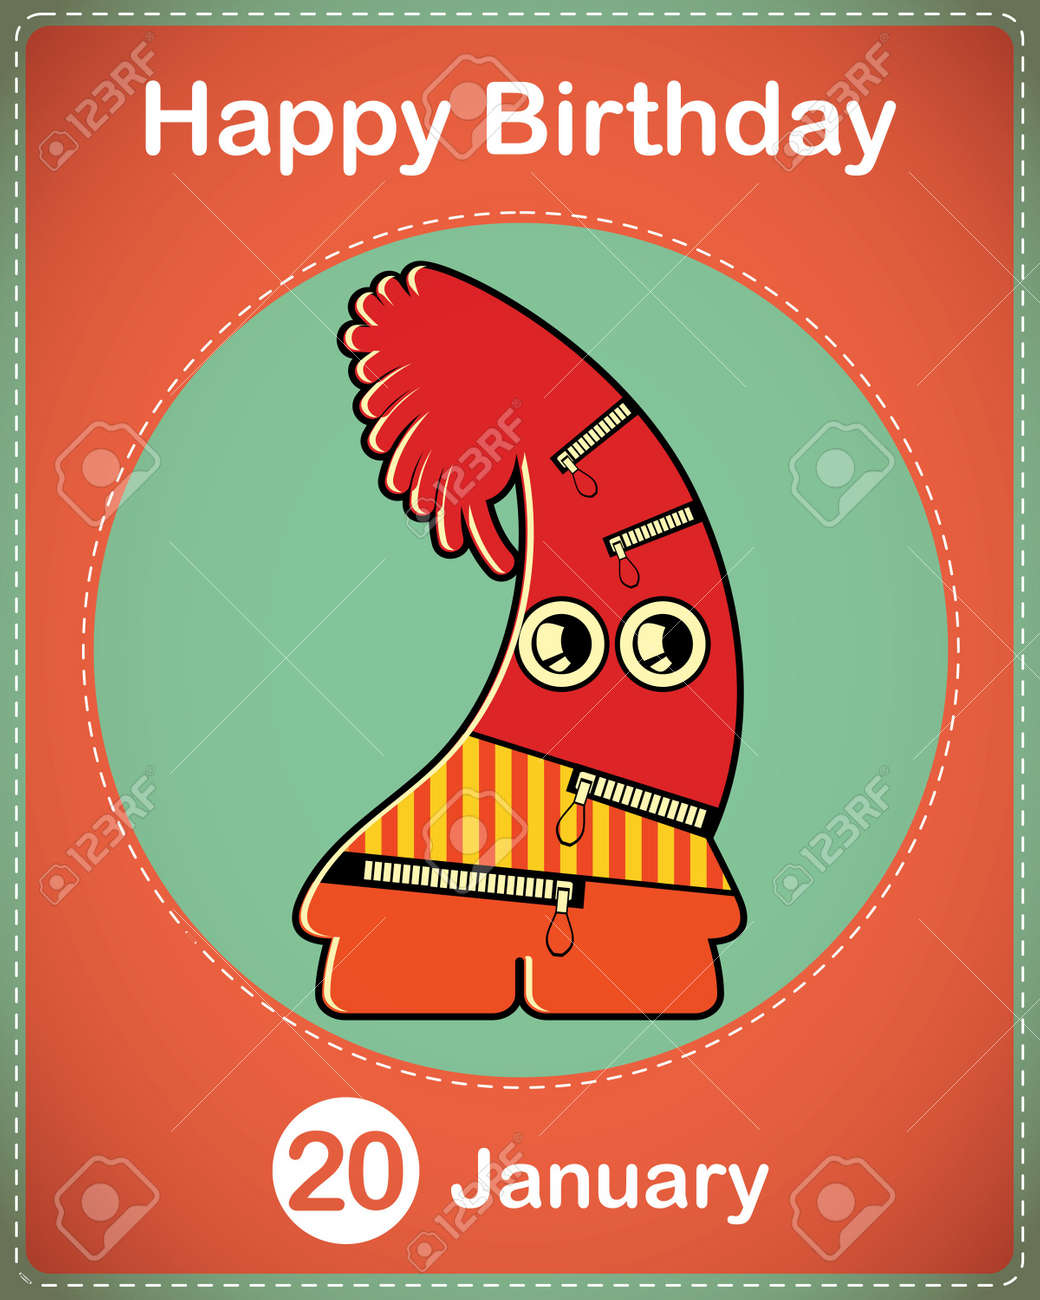 Happy birthday card with cute cartoon monster Stock Vector - 17577909